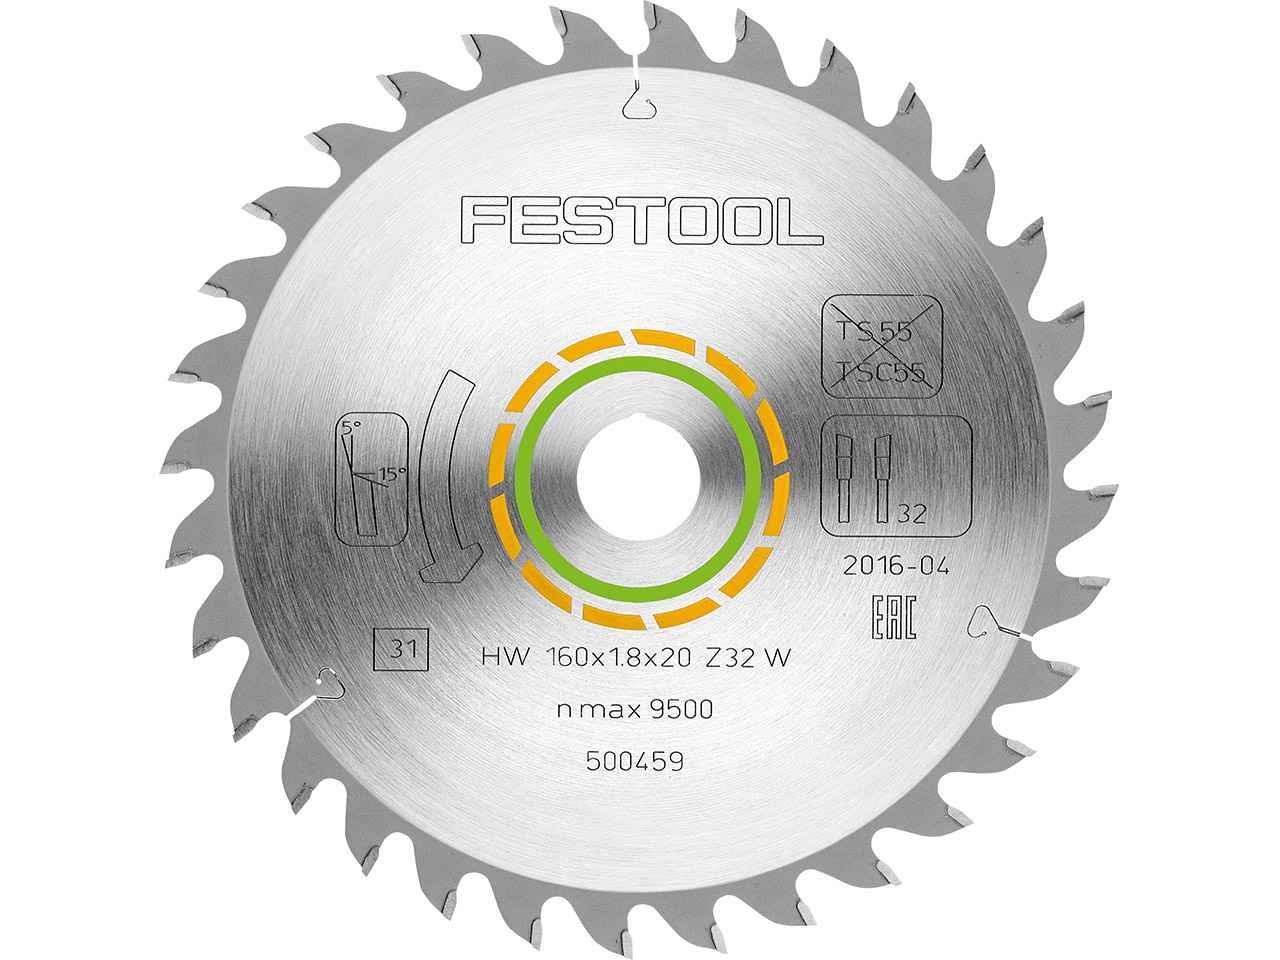 Festool_500459.jpg